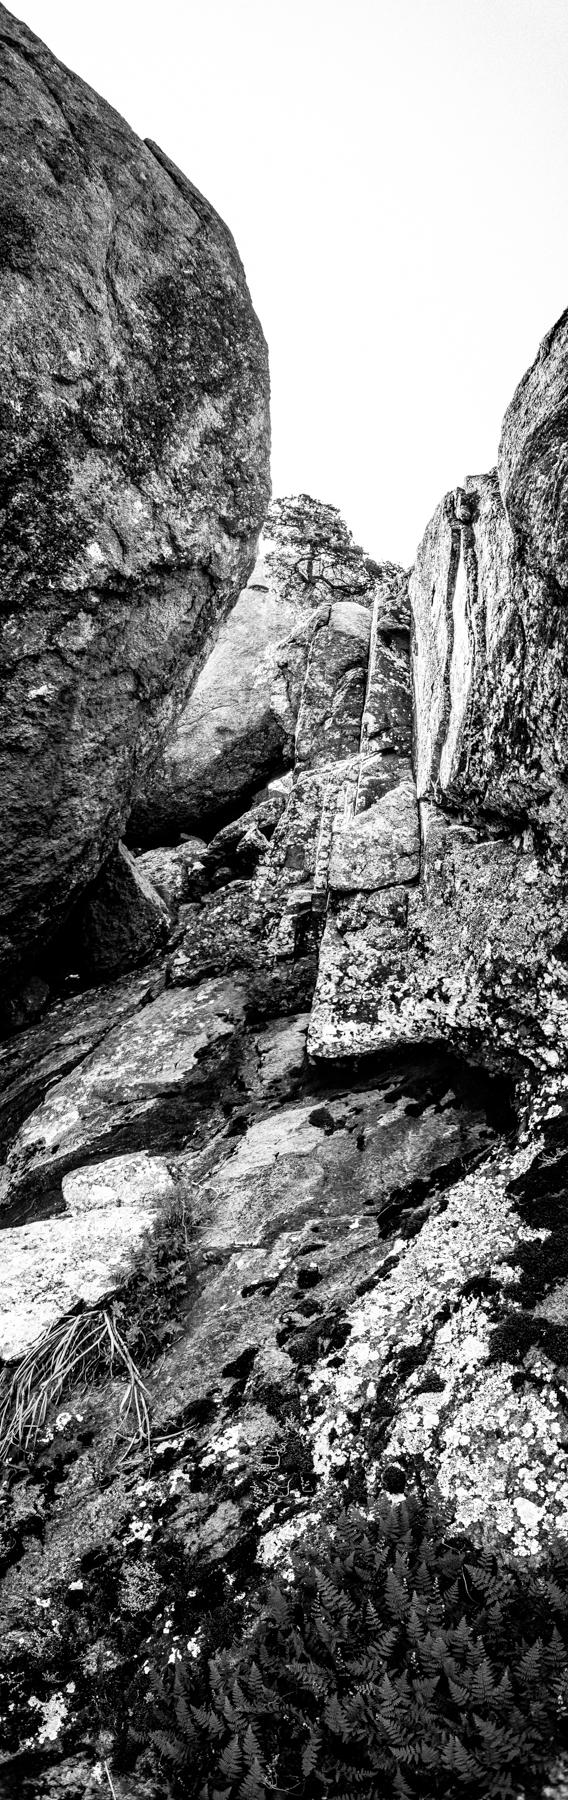 2017-06-25 Mount Lincoln B (5 of 20).jpg